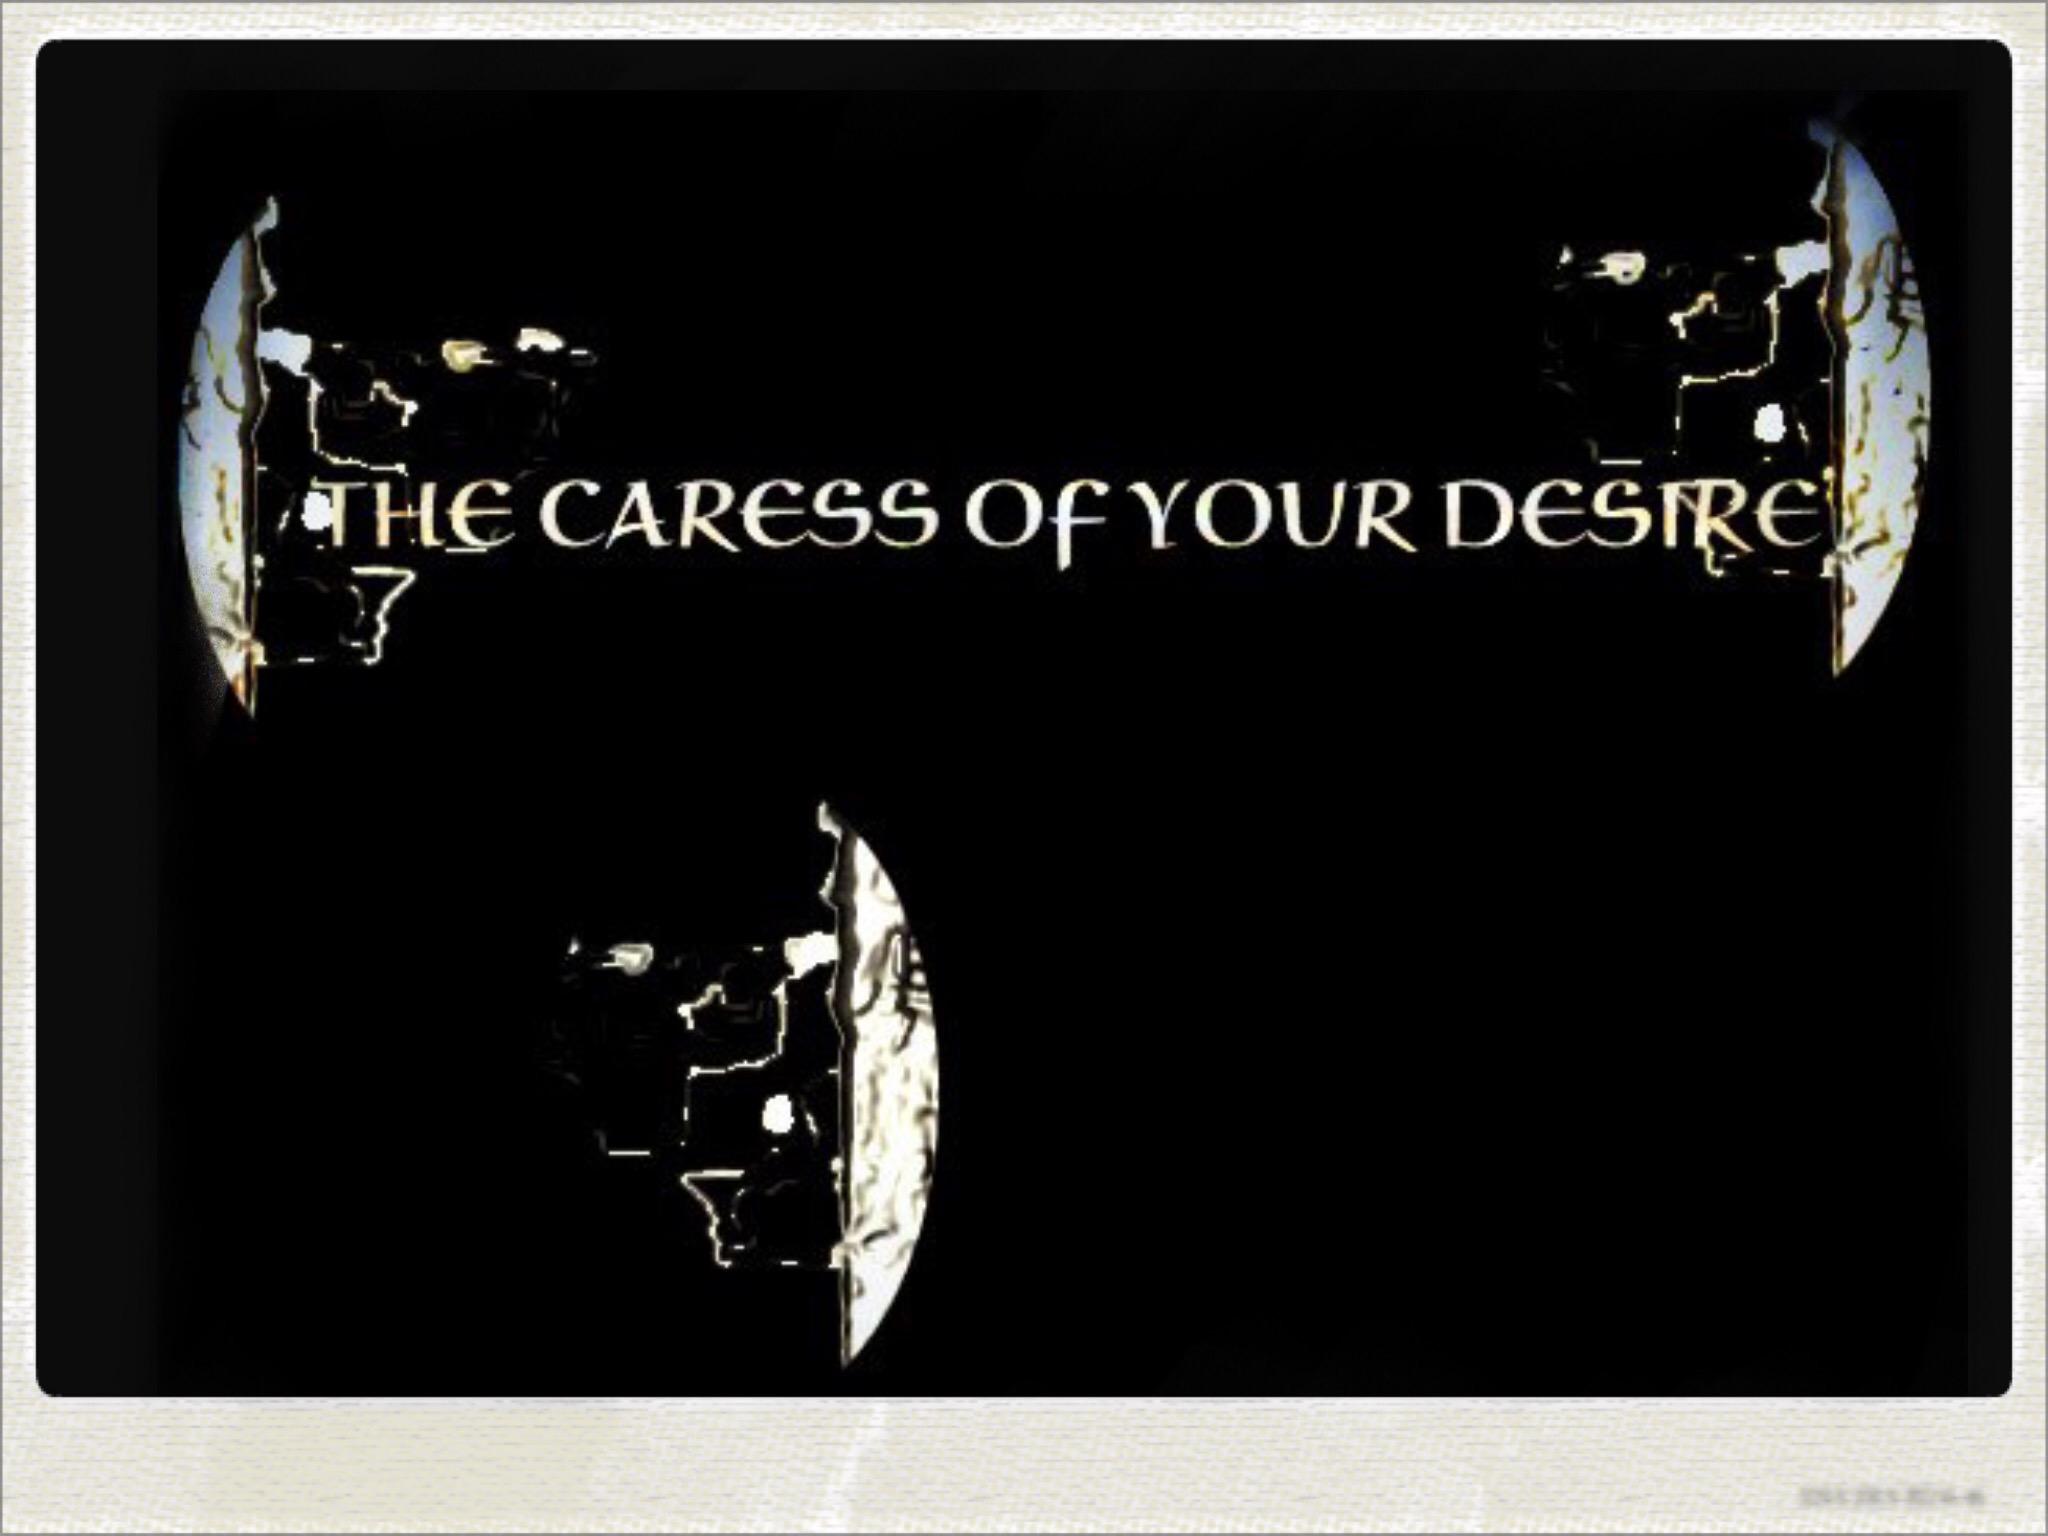 A caress of desire